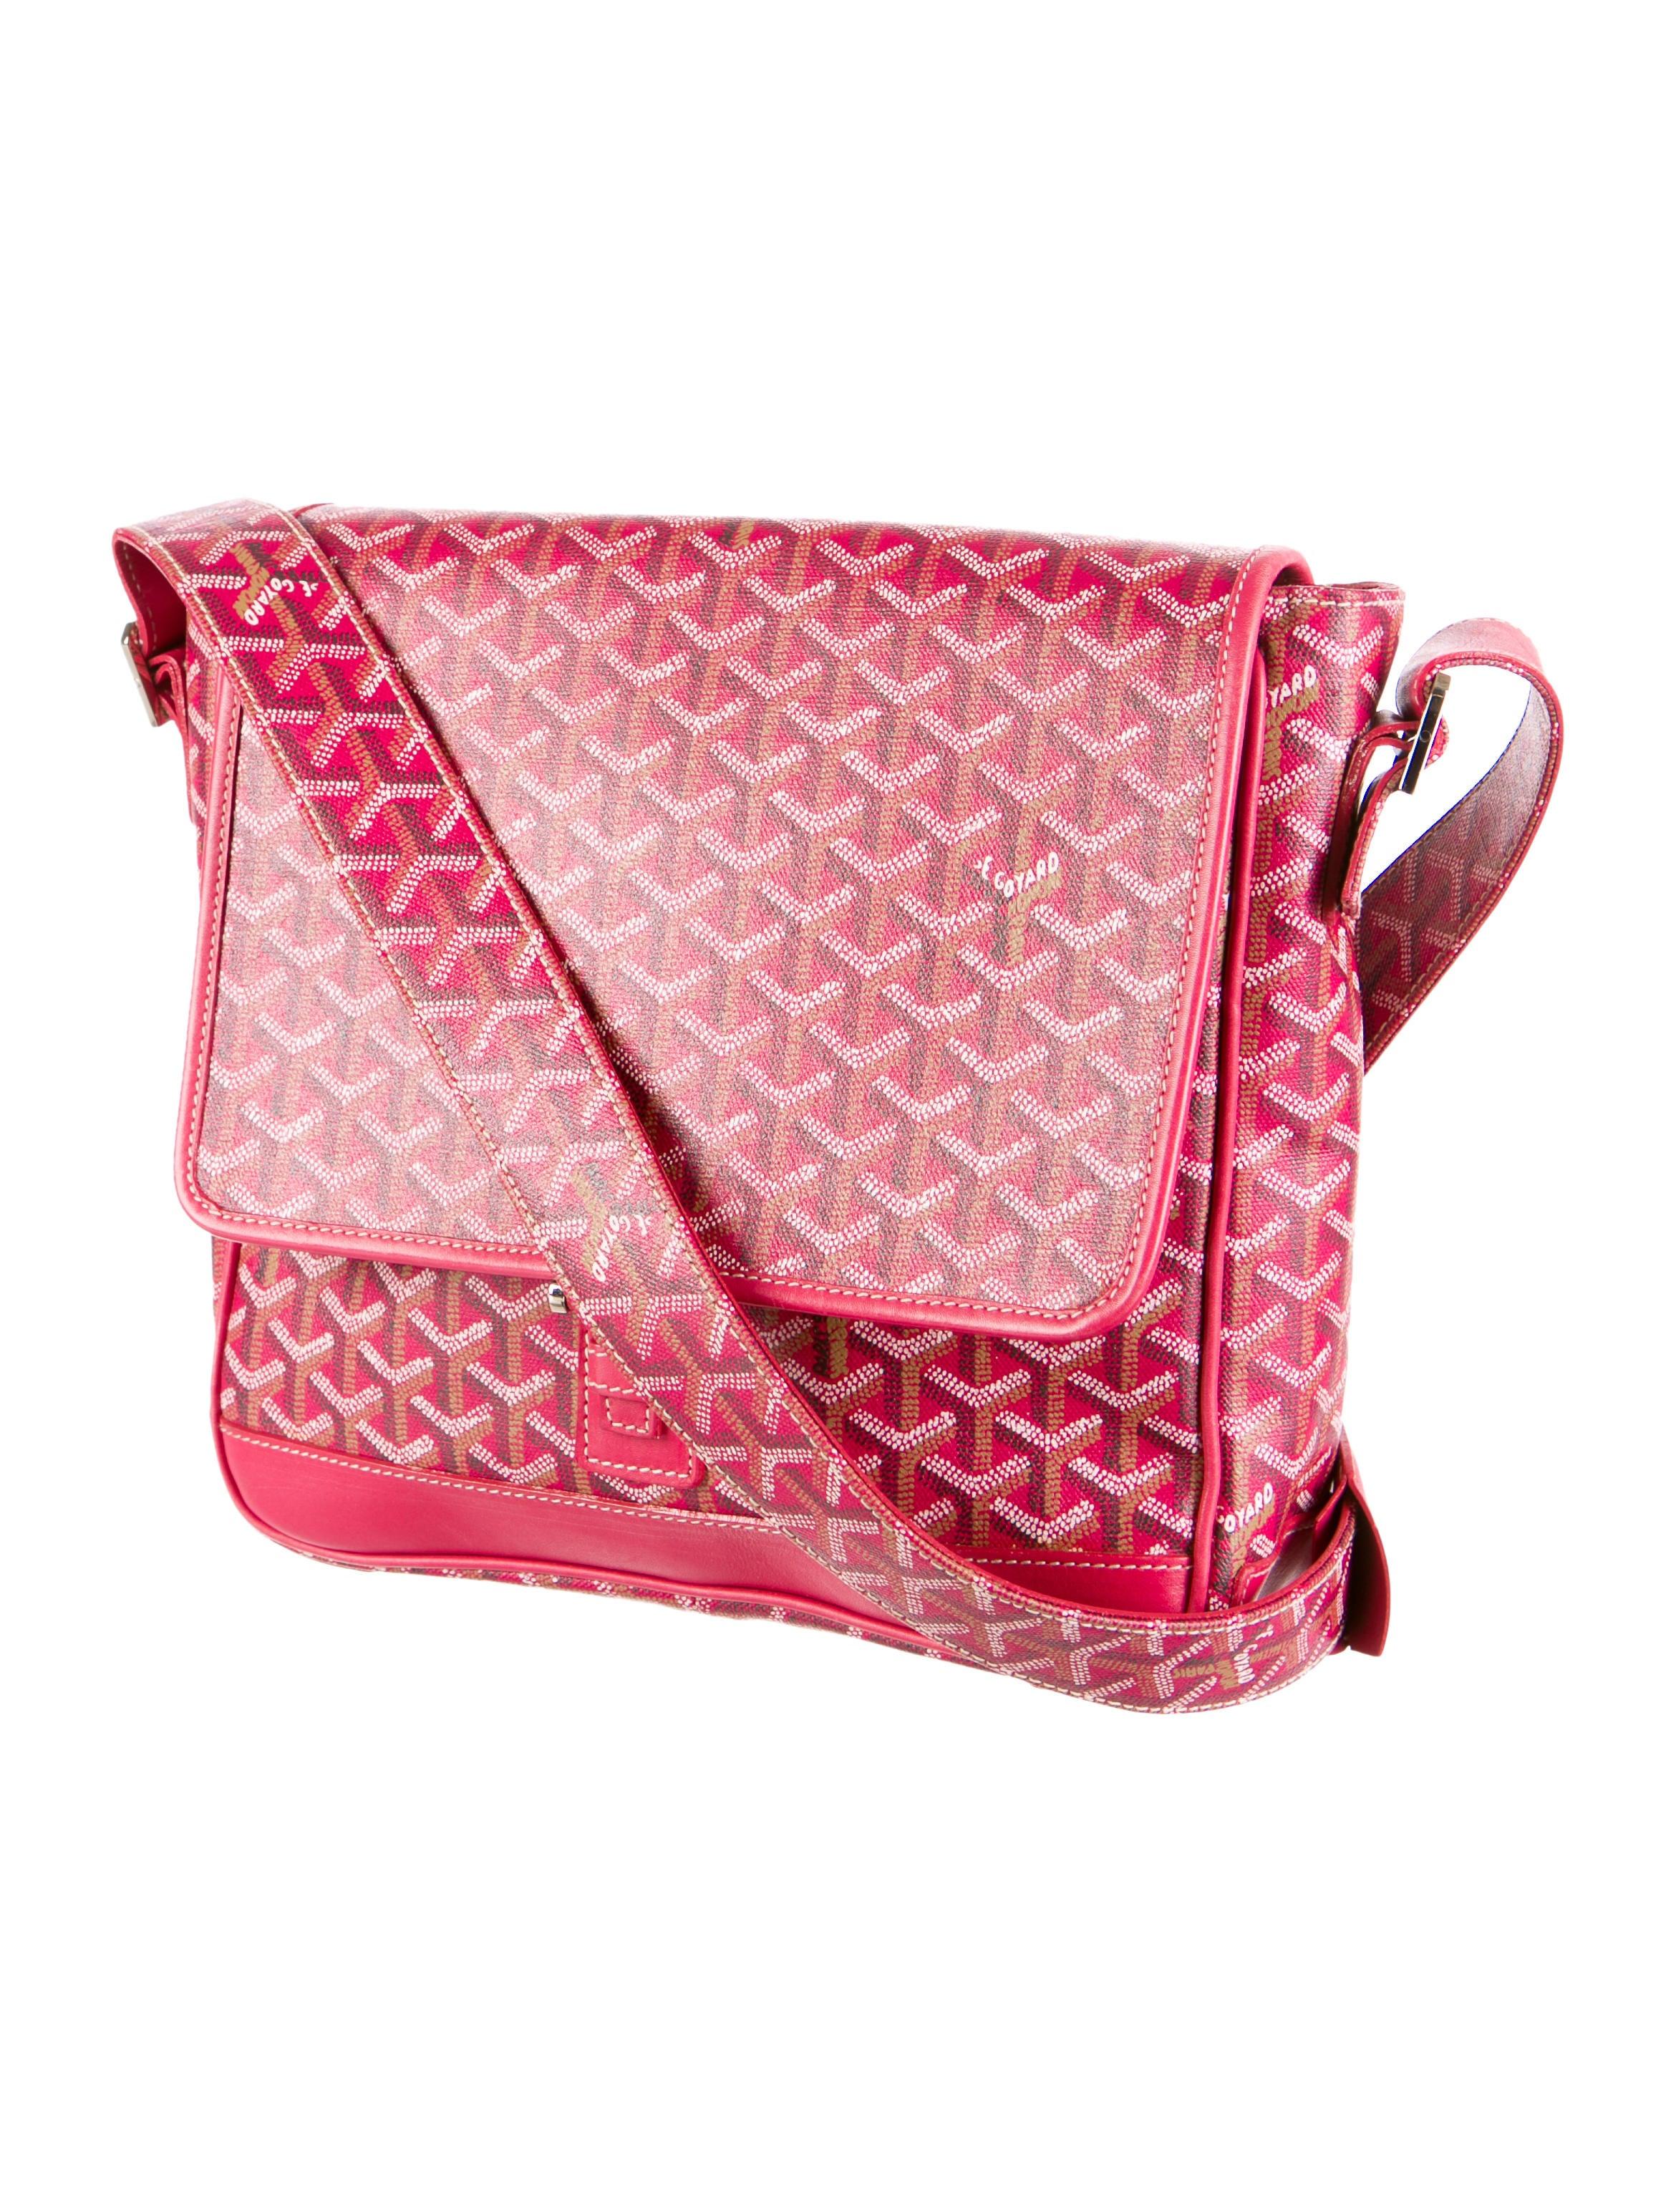 Goyard Urbain Messenger Bag Handbags Goy20568 The